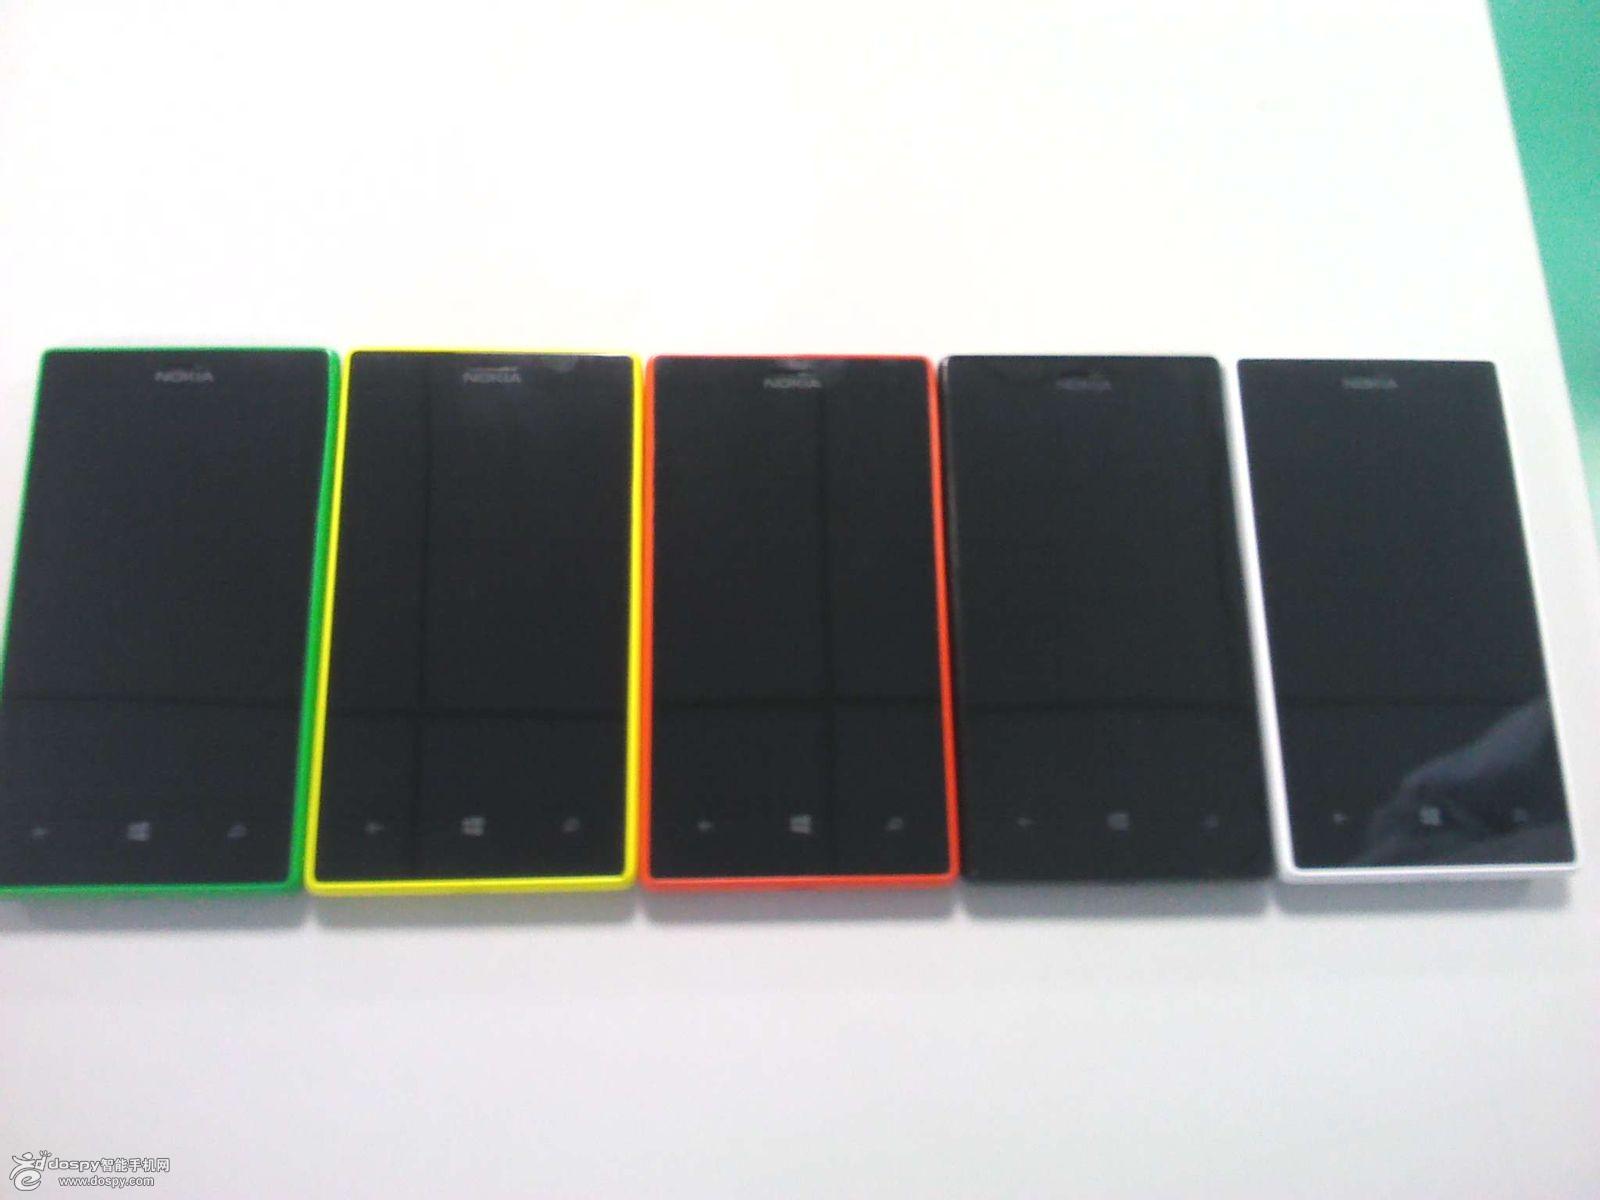 Nokia-Lumia-830-ifa-berlin